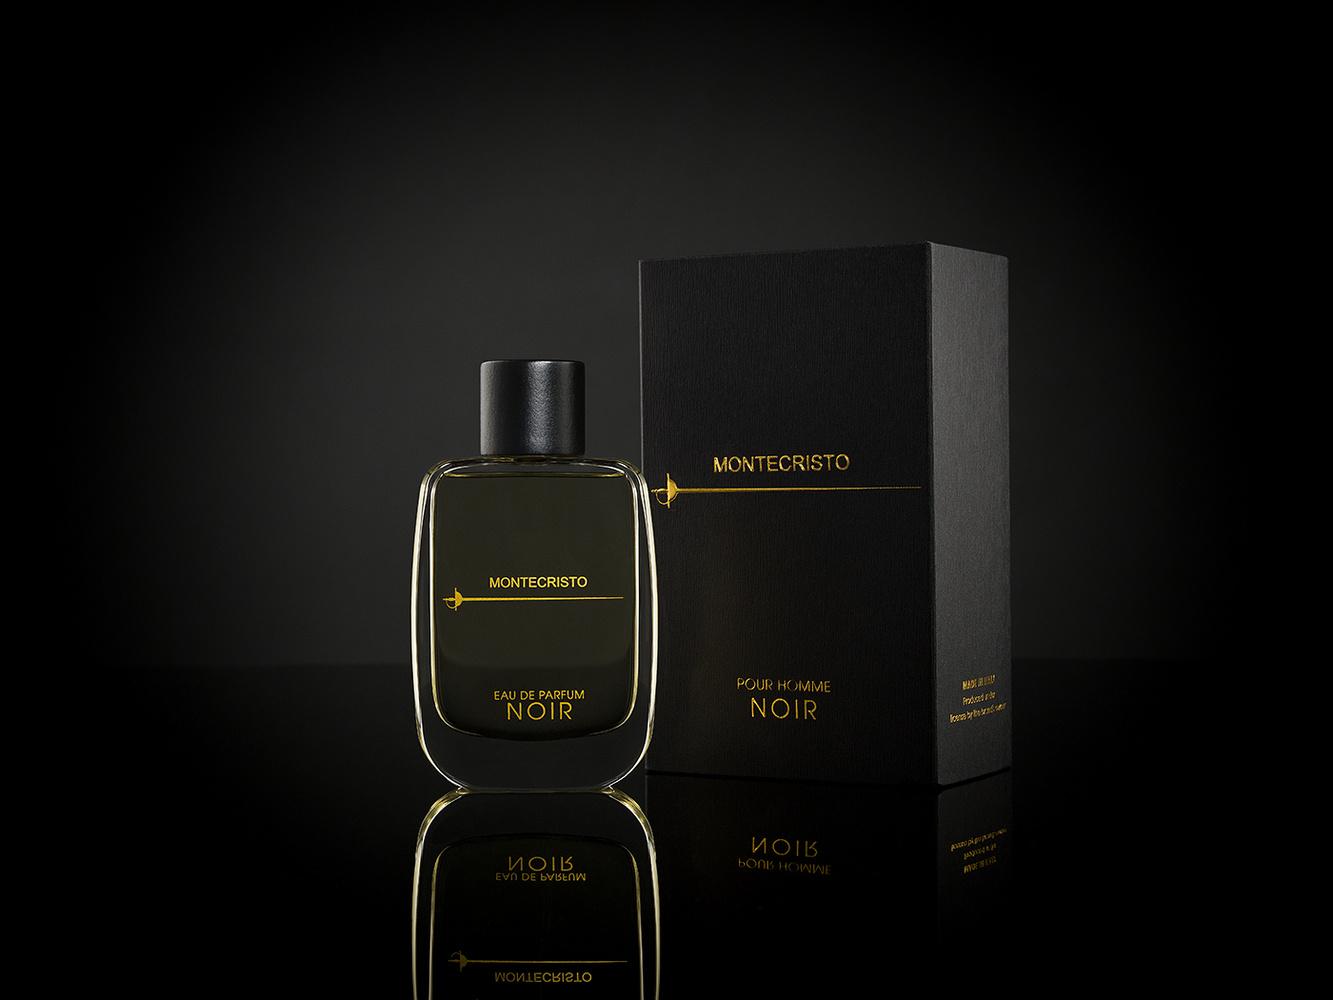 Montecristo perfume by Markus Pettersson